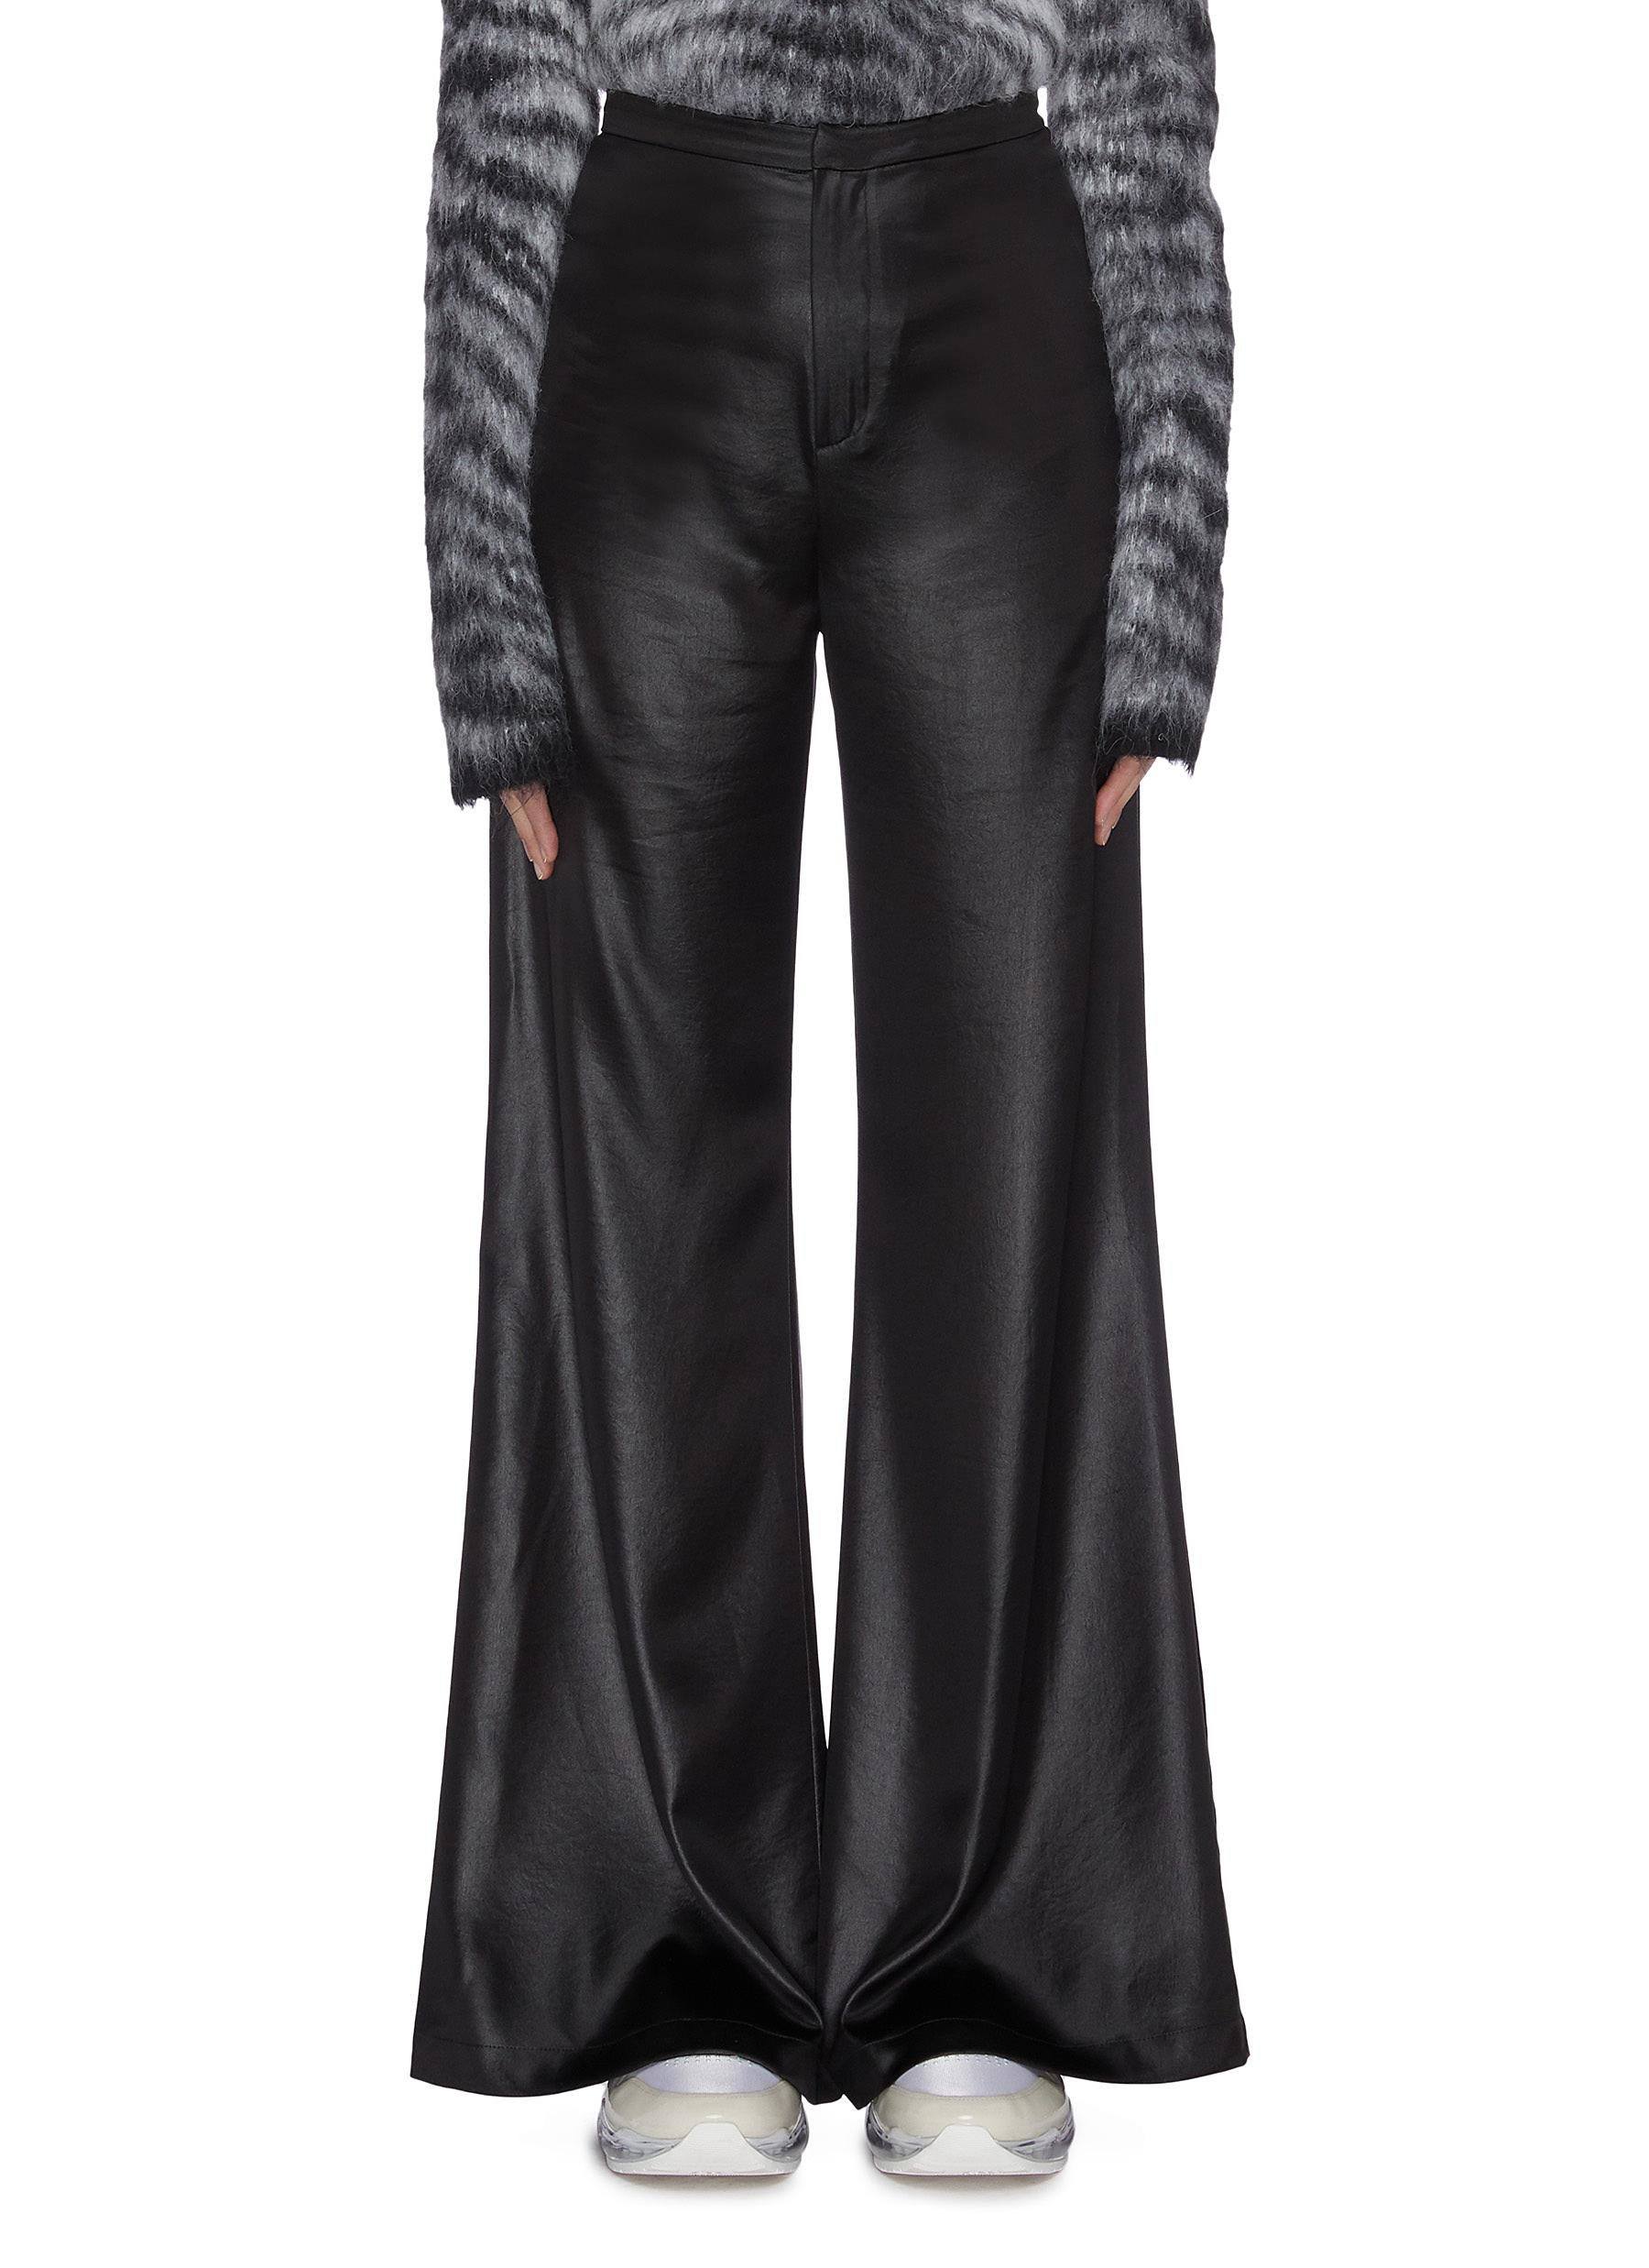 Buy Alexanderwang.T Pants & Shorts 'Wash & Go' wet shine pants